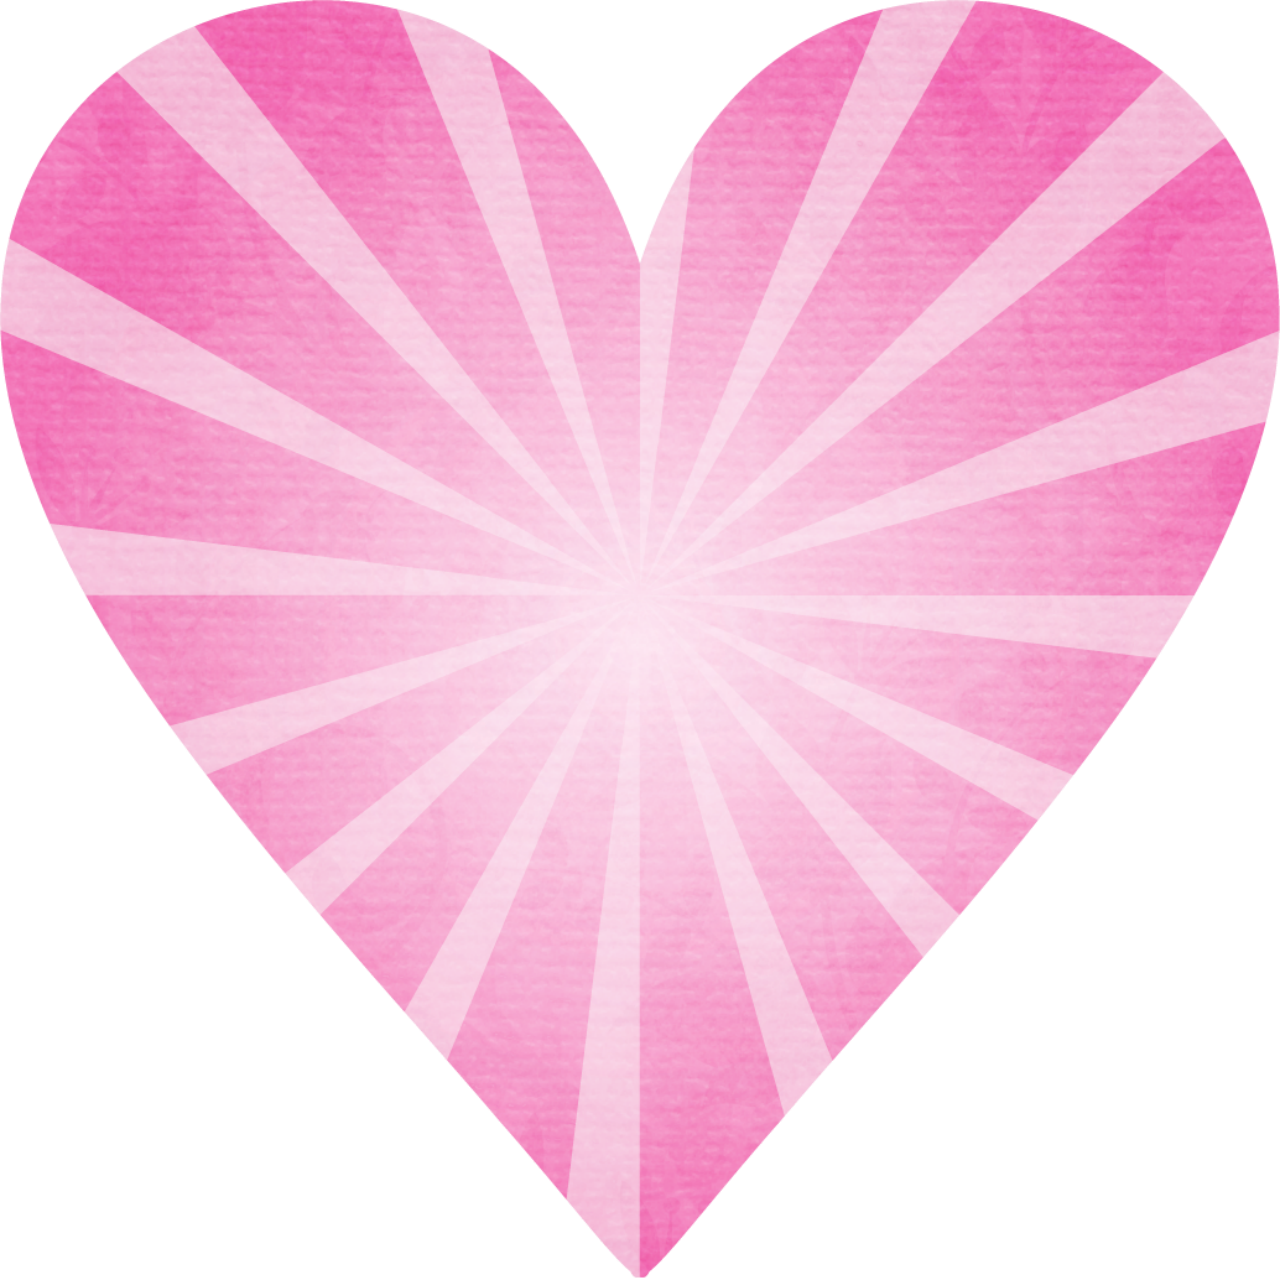 Png transparent pink heart. Heartbeat clipart blue